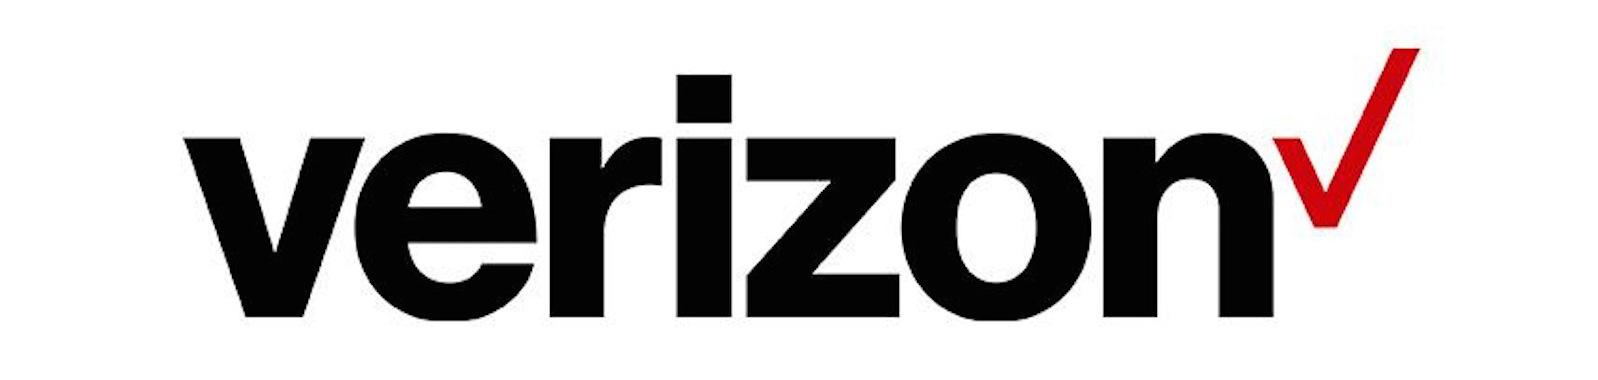 verizon_new.jpg